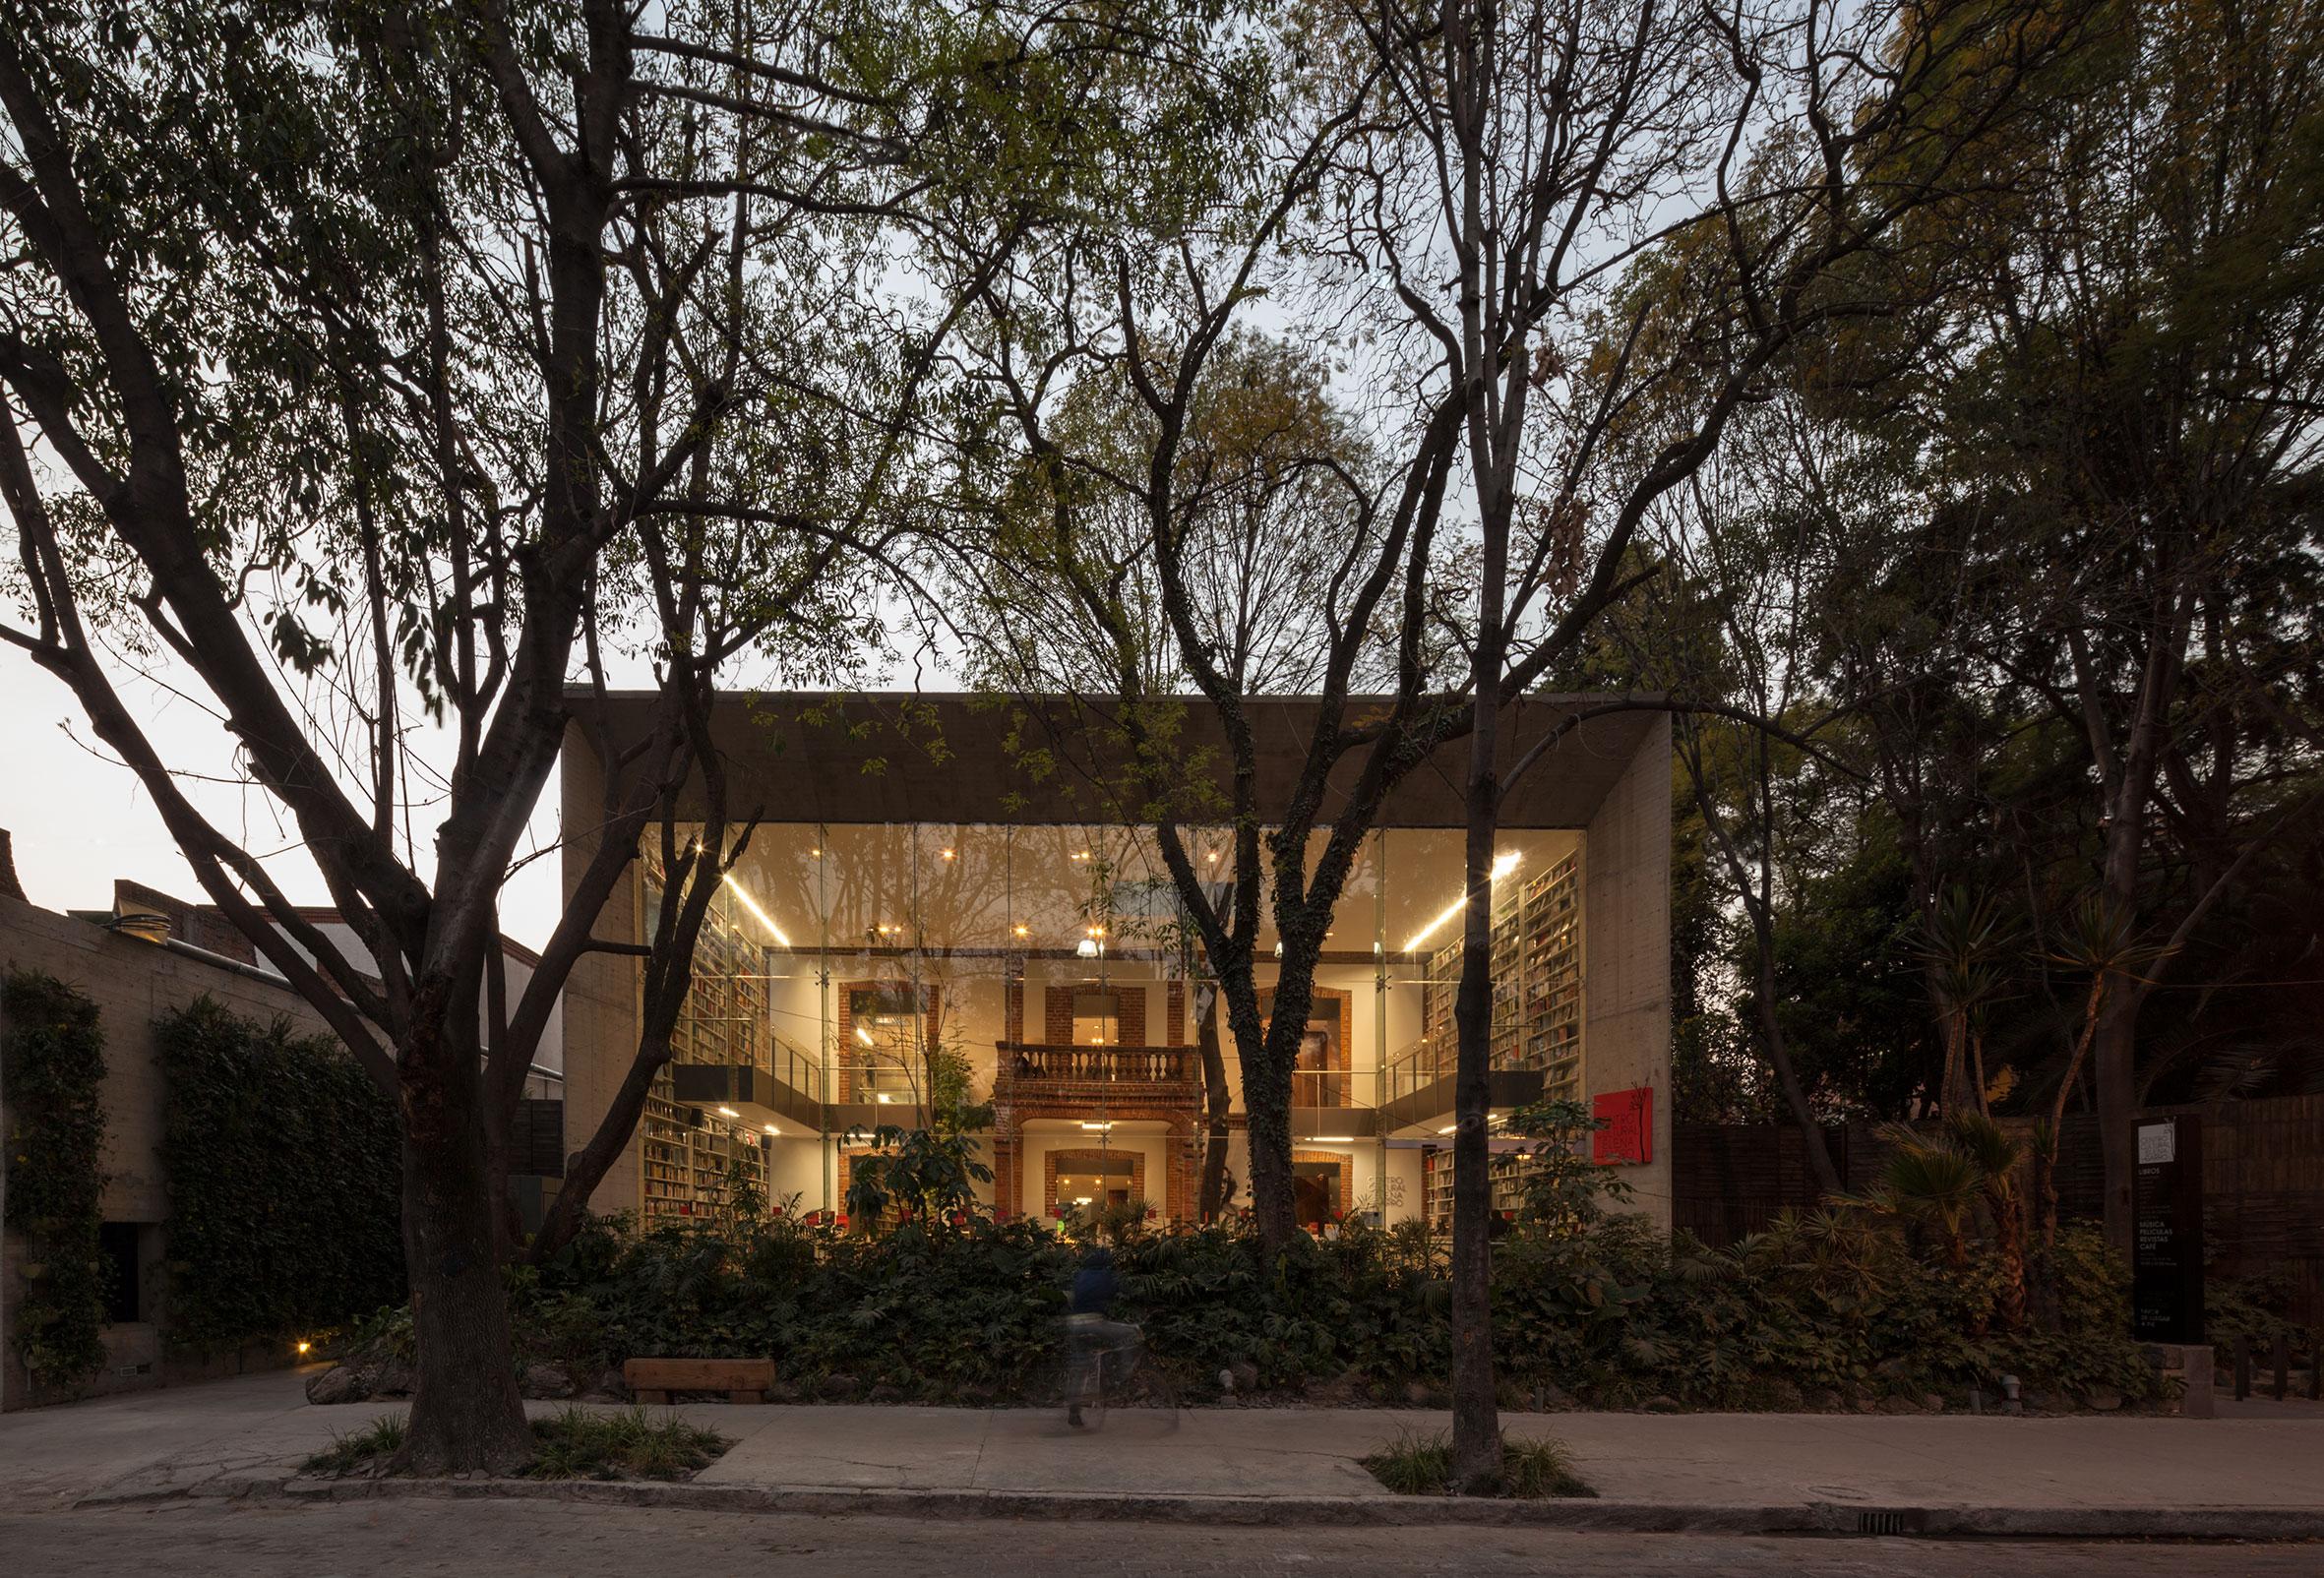 The Elena Garro Cultural Center's street-facing bookstore in Mexico City's Coyoacán neighborhood. Courtesy of Fernanda Canales.